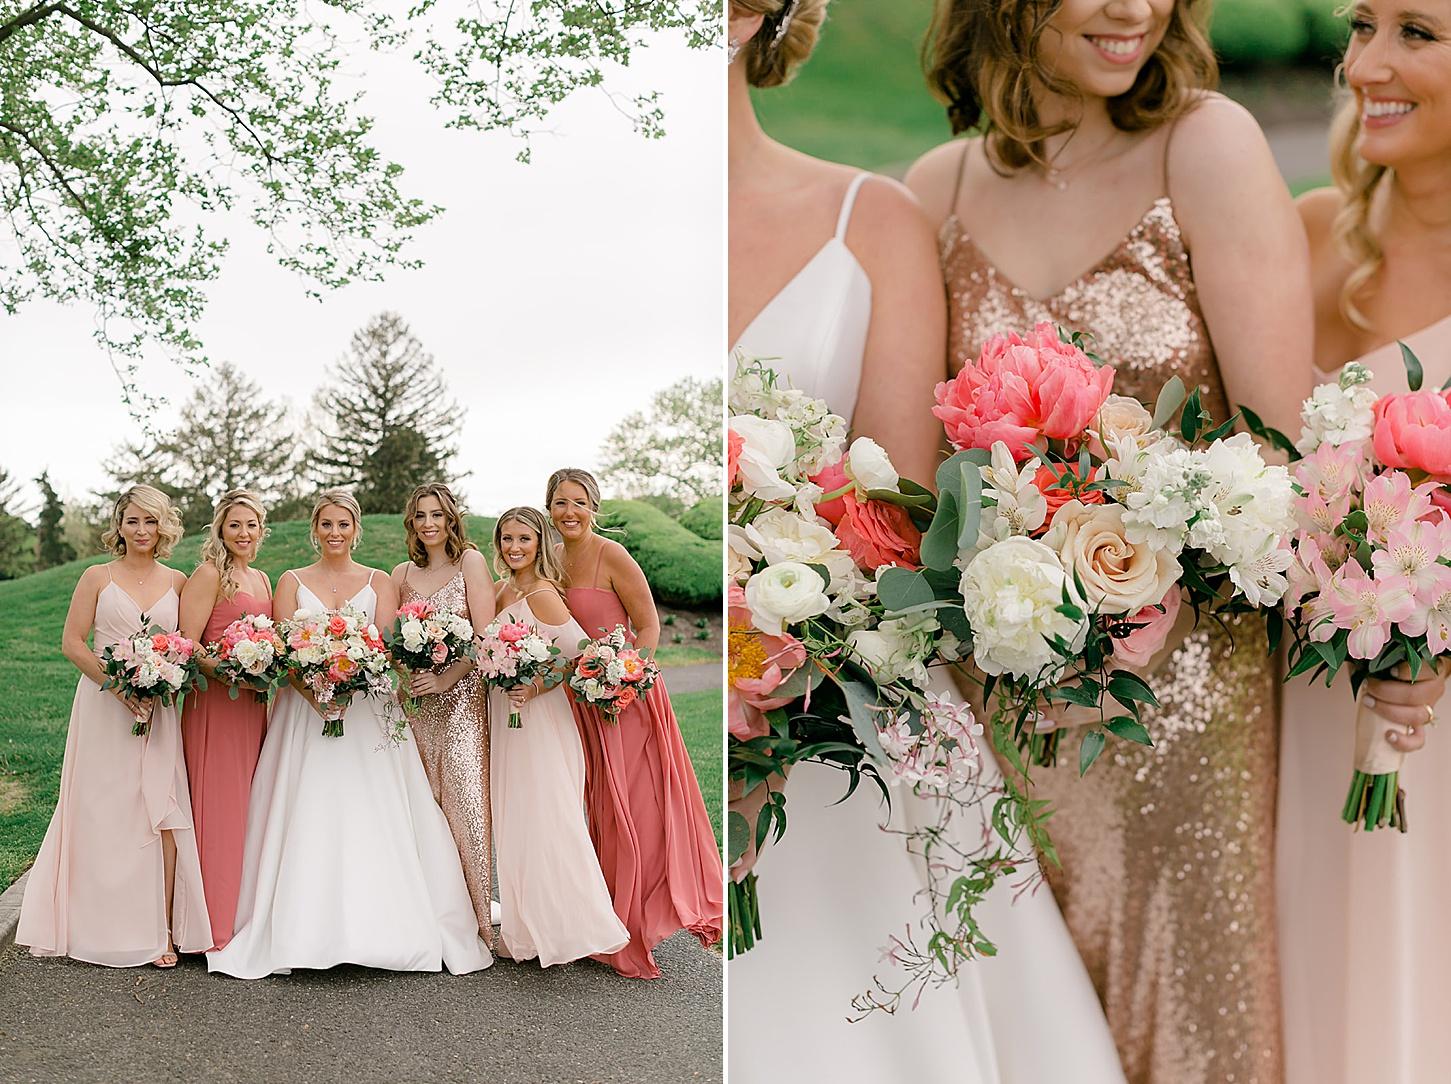 Linwood Country Club Summer Wedding Photography Studio by Magdalena Studios Jenn Kyle 0030